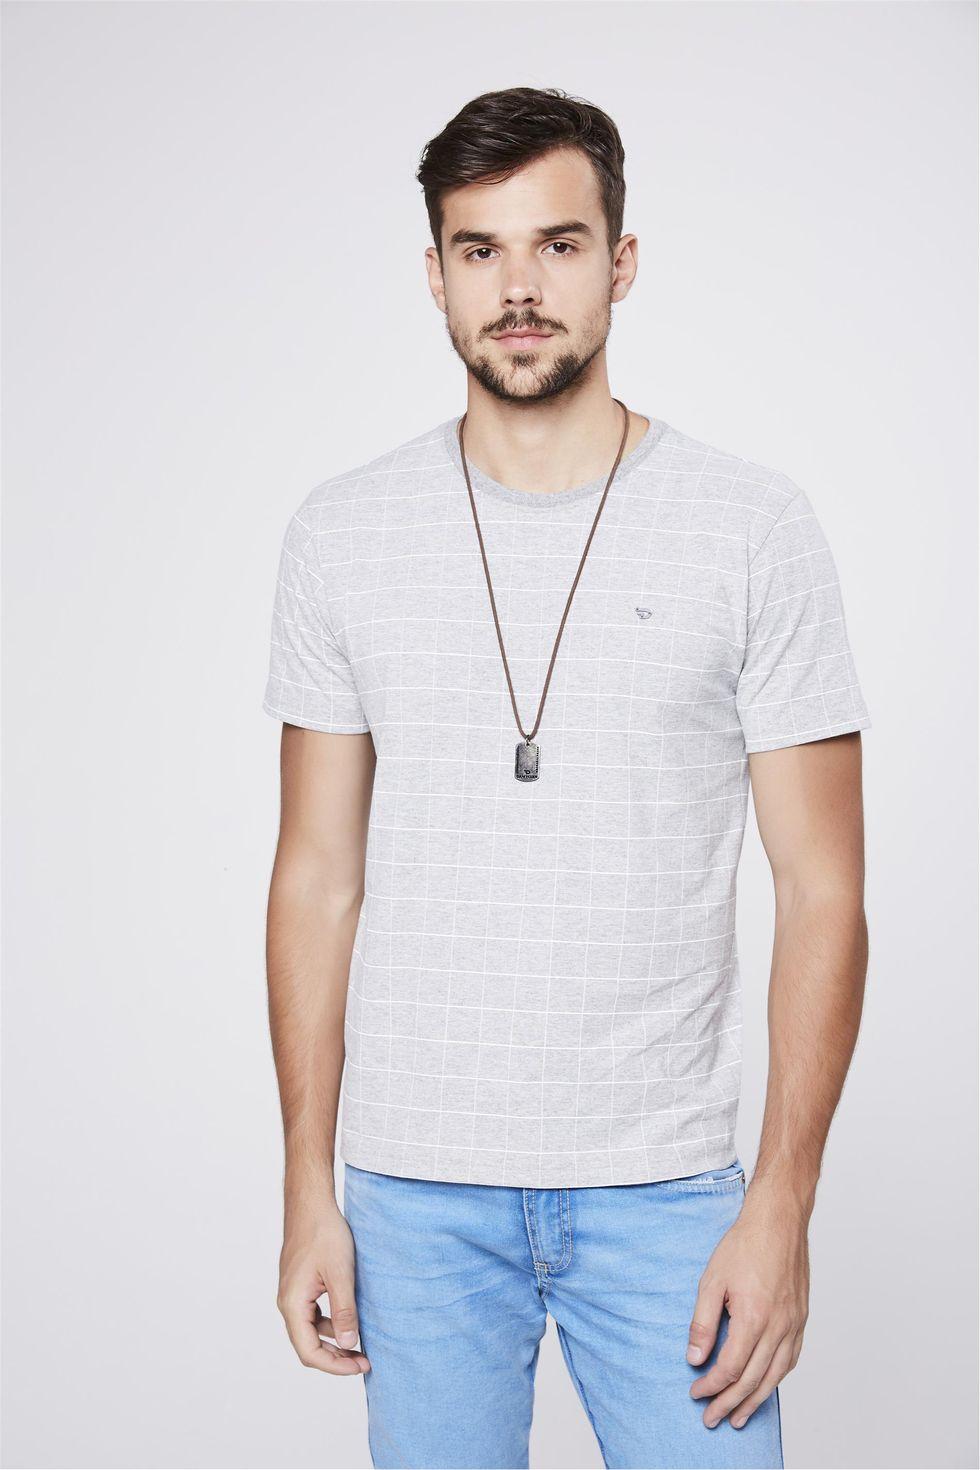 Camiseta-Cinza-Mescla-com-Estampa-Xadrez-Frente--